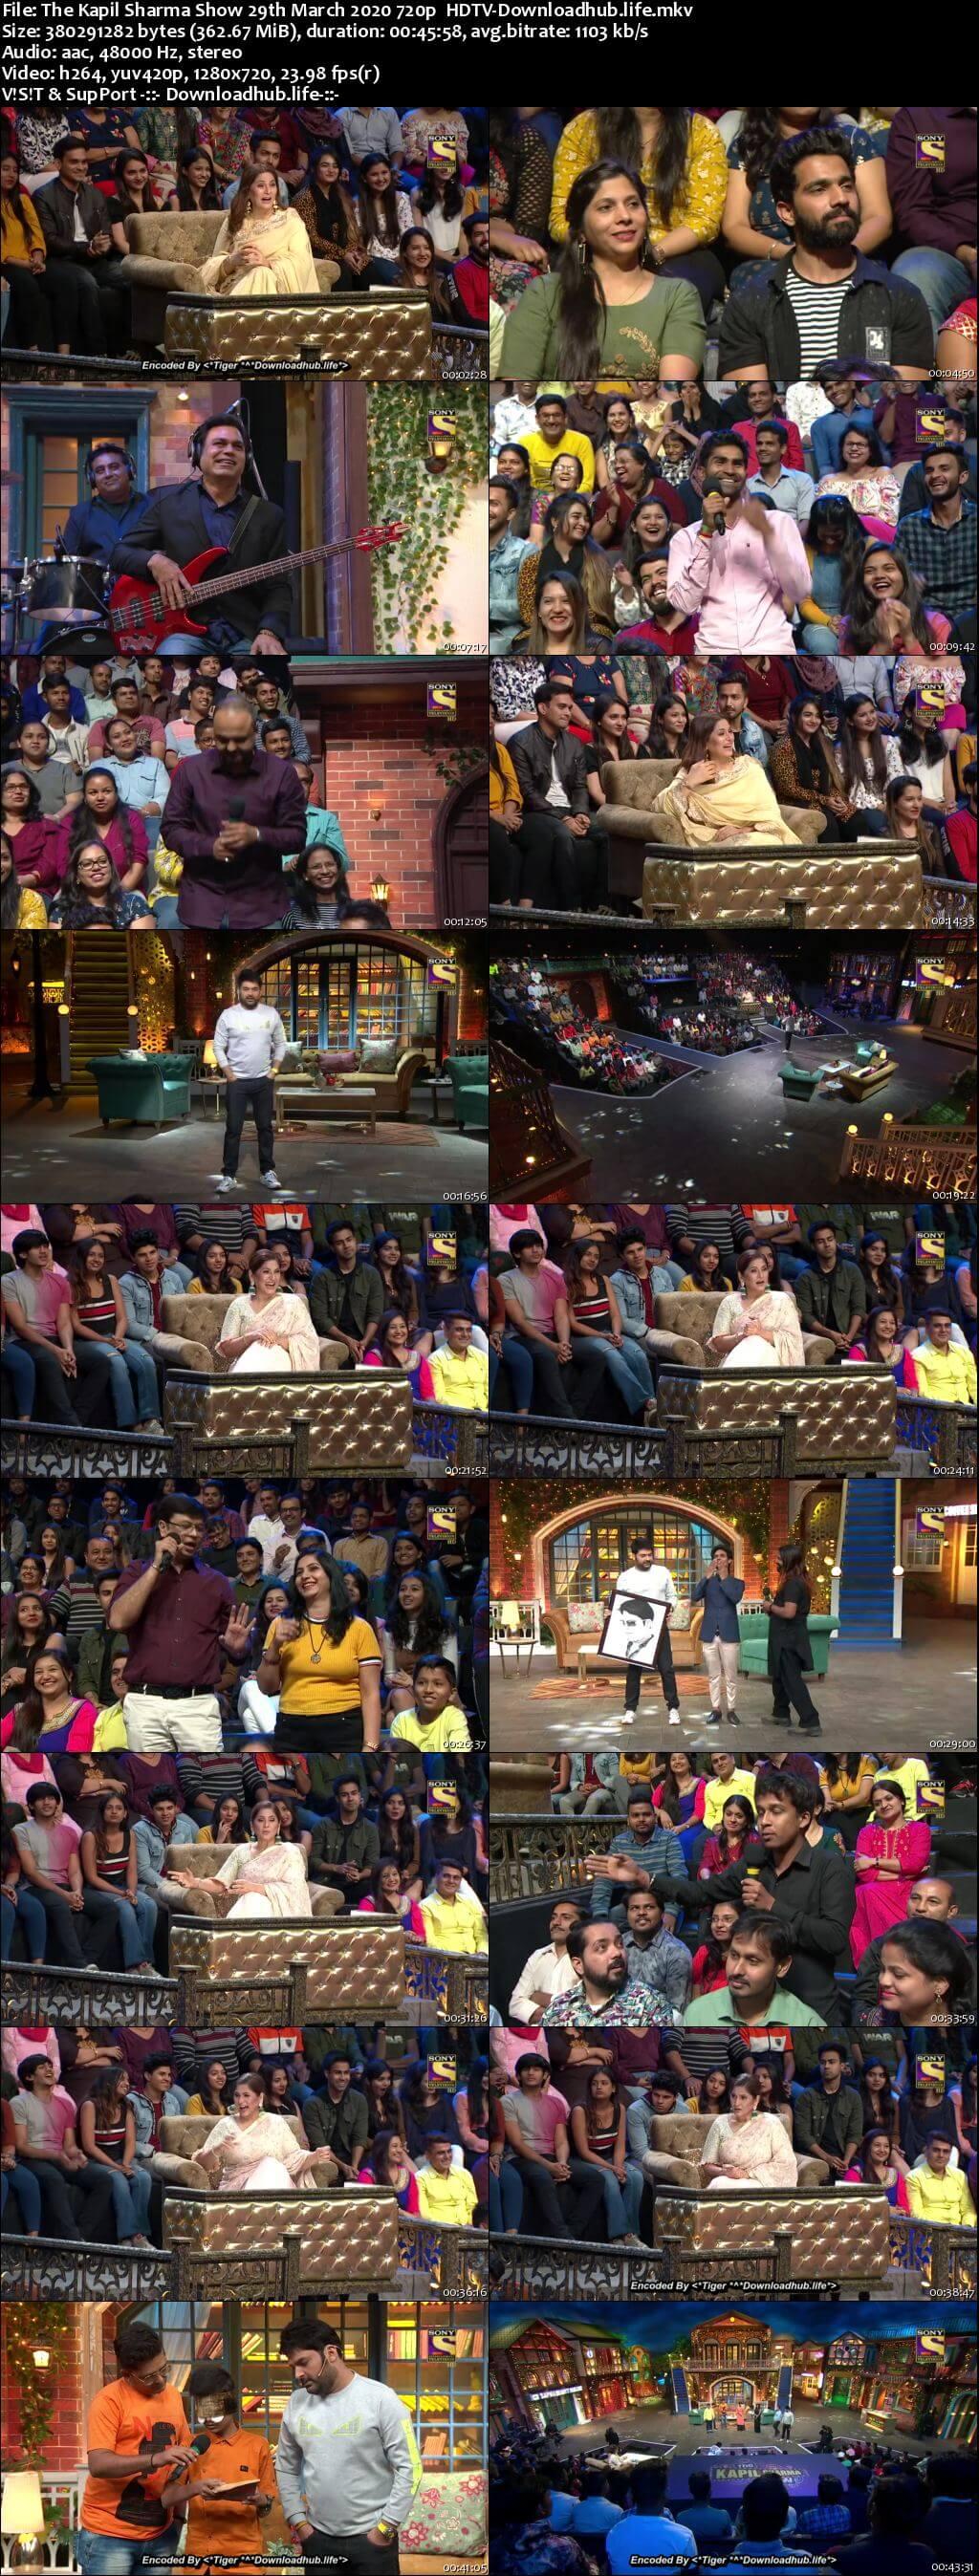 The Kapil Sharma Show 29 March 2020 Episode 127 HDTV 720p 480p